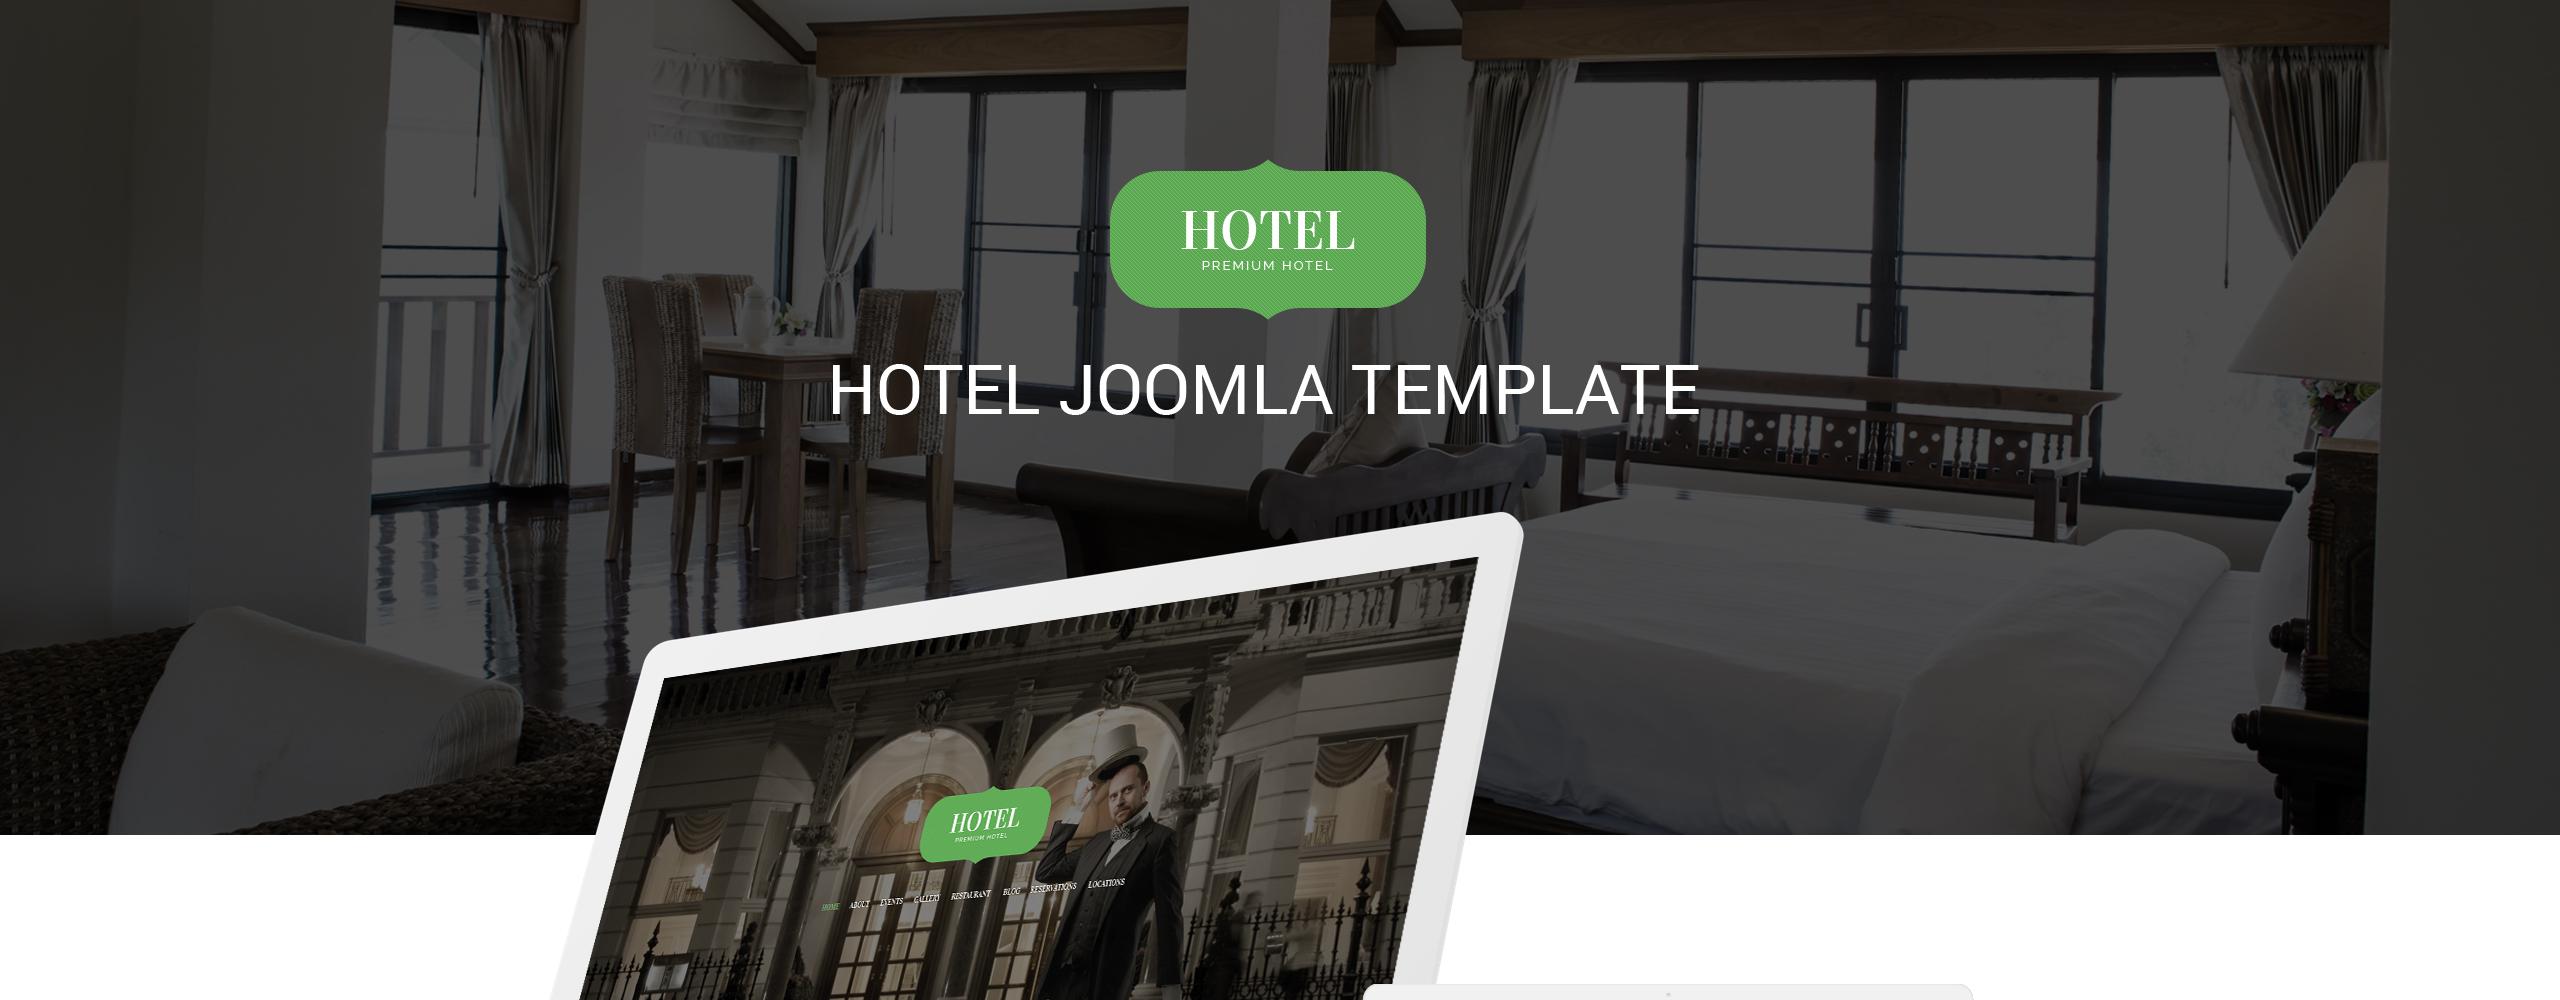 Hotel, Travel & Casino Joomla Template